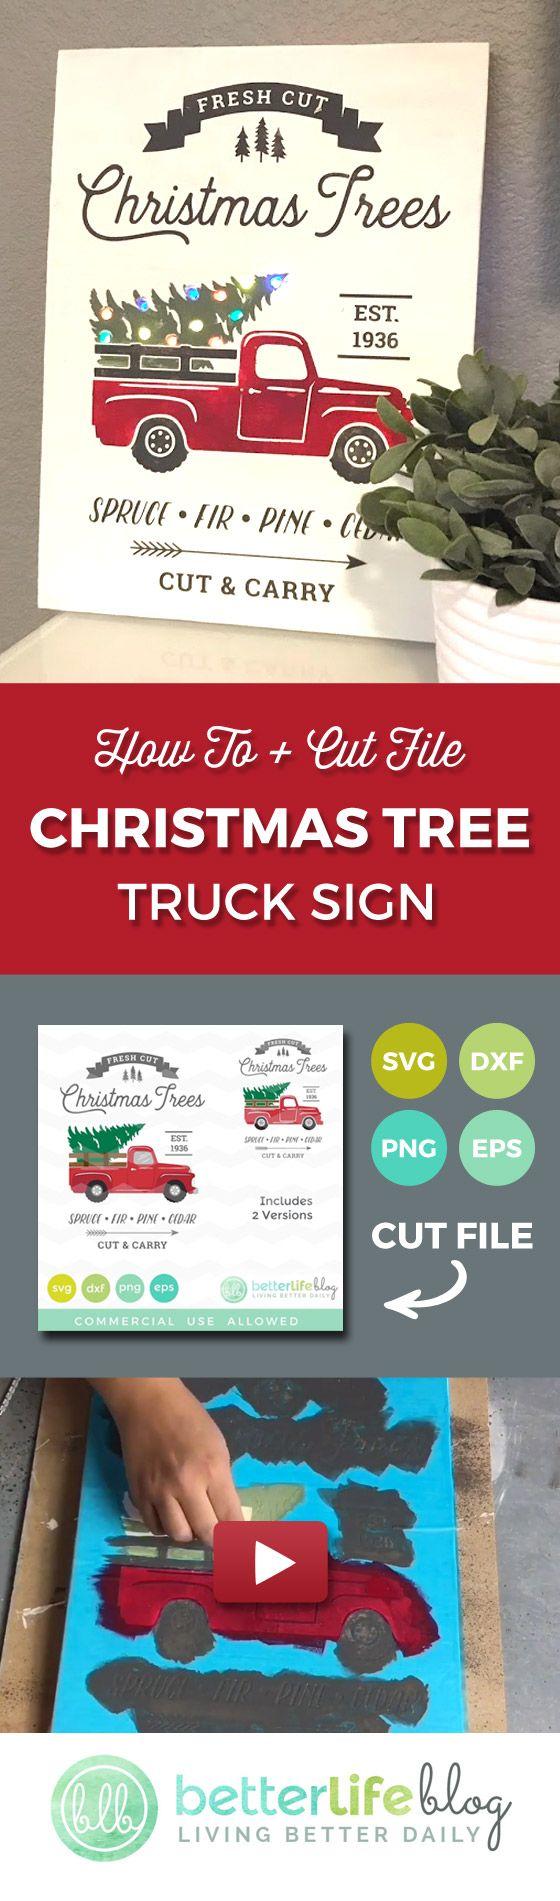 Christmas Tree Truck Sign Tutorial (plus tips to prevent bleeding)